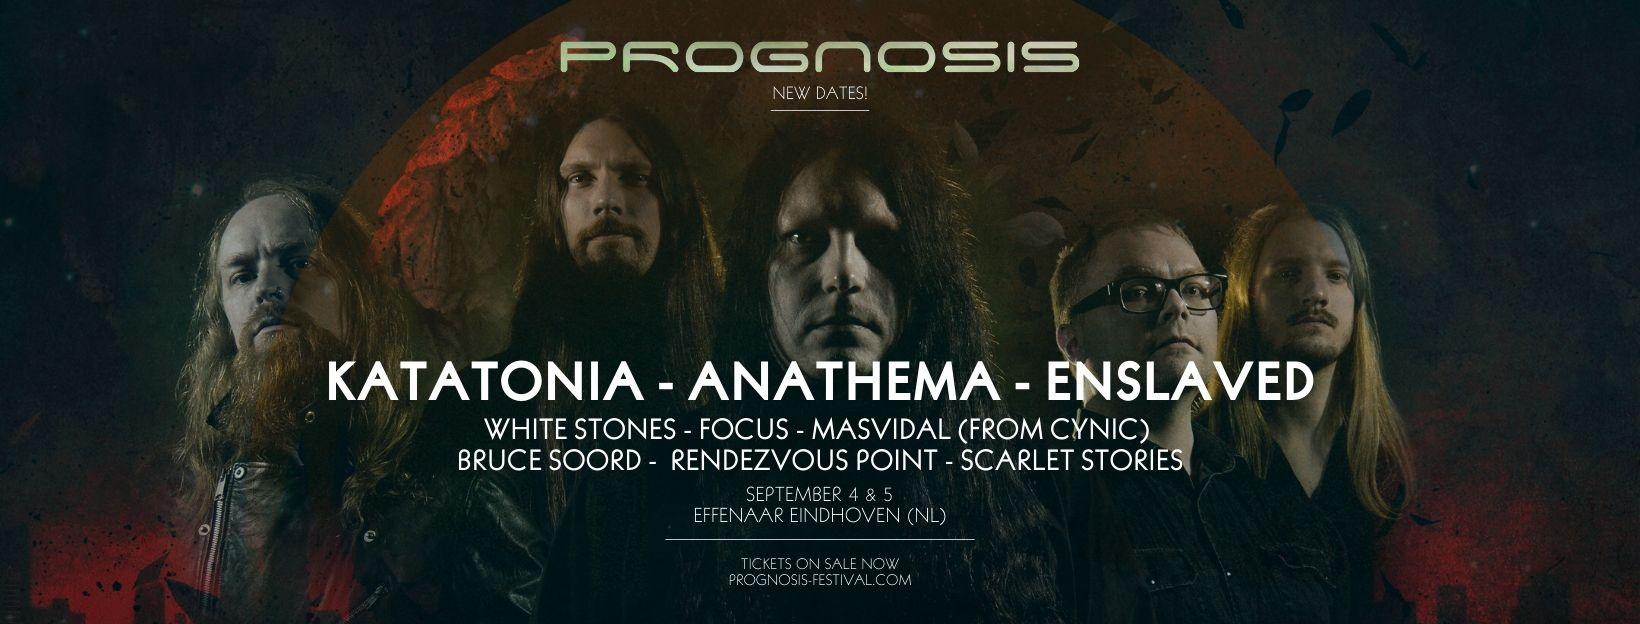 Prognosis Festival @ Effenaar – Eindhoven